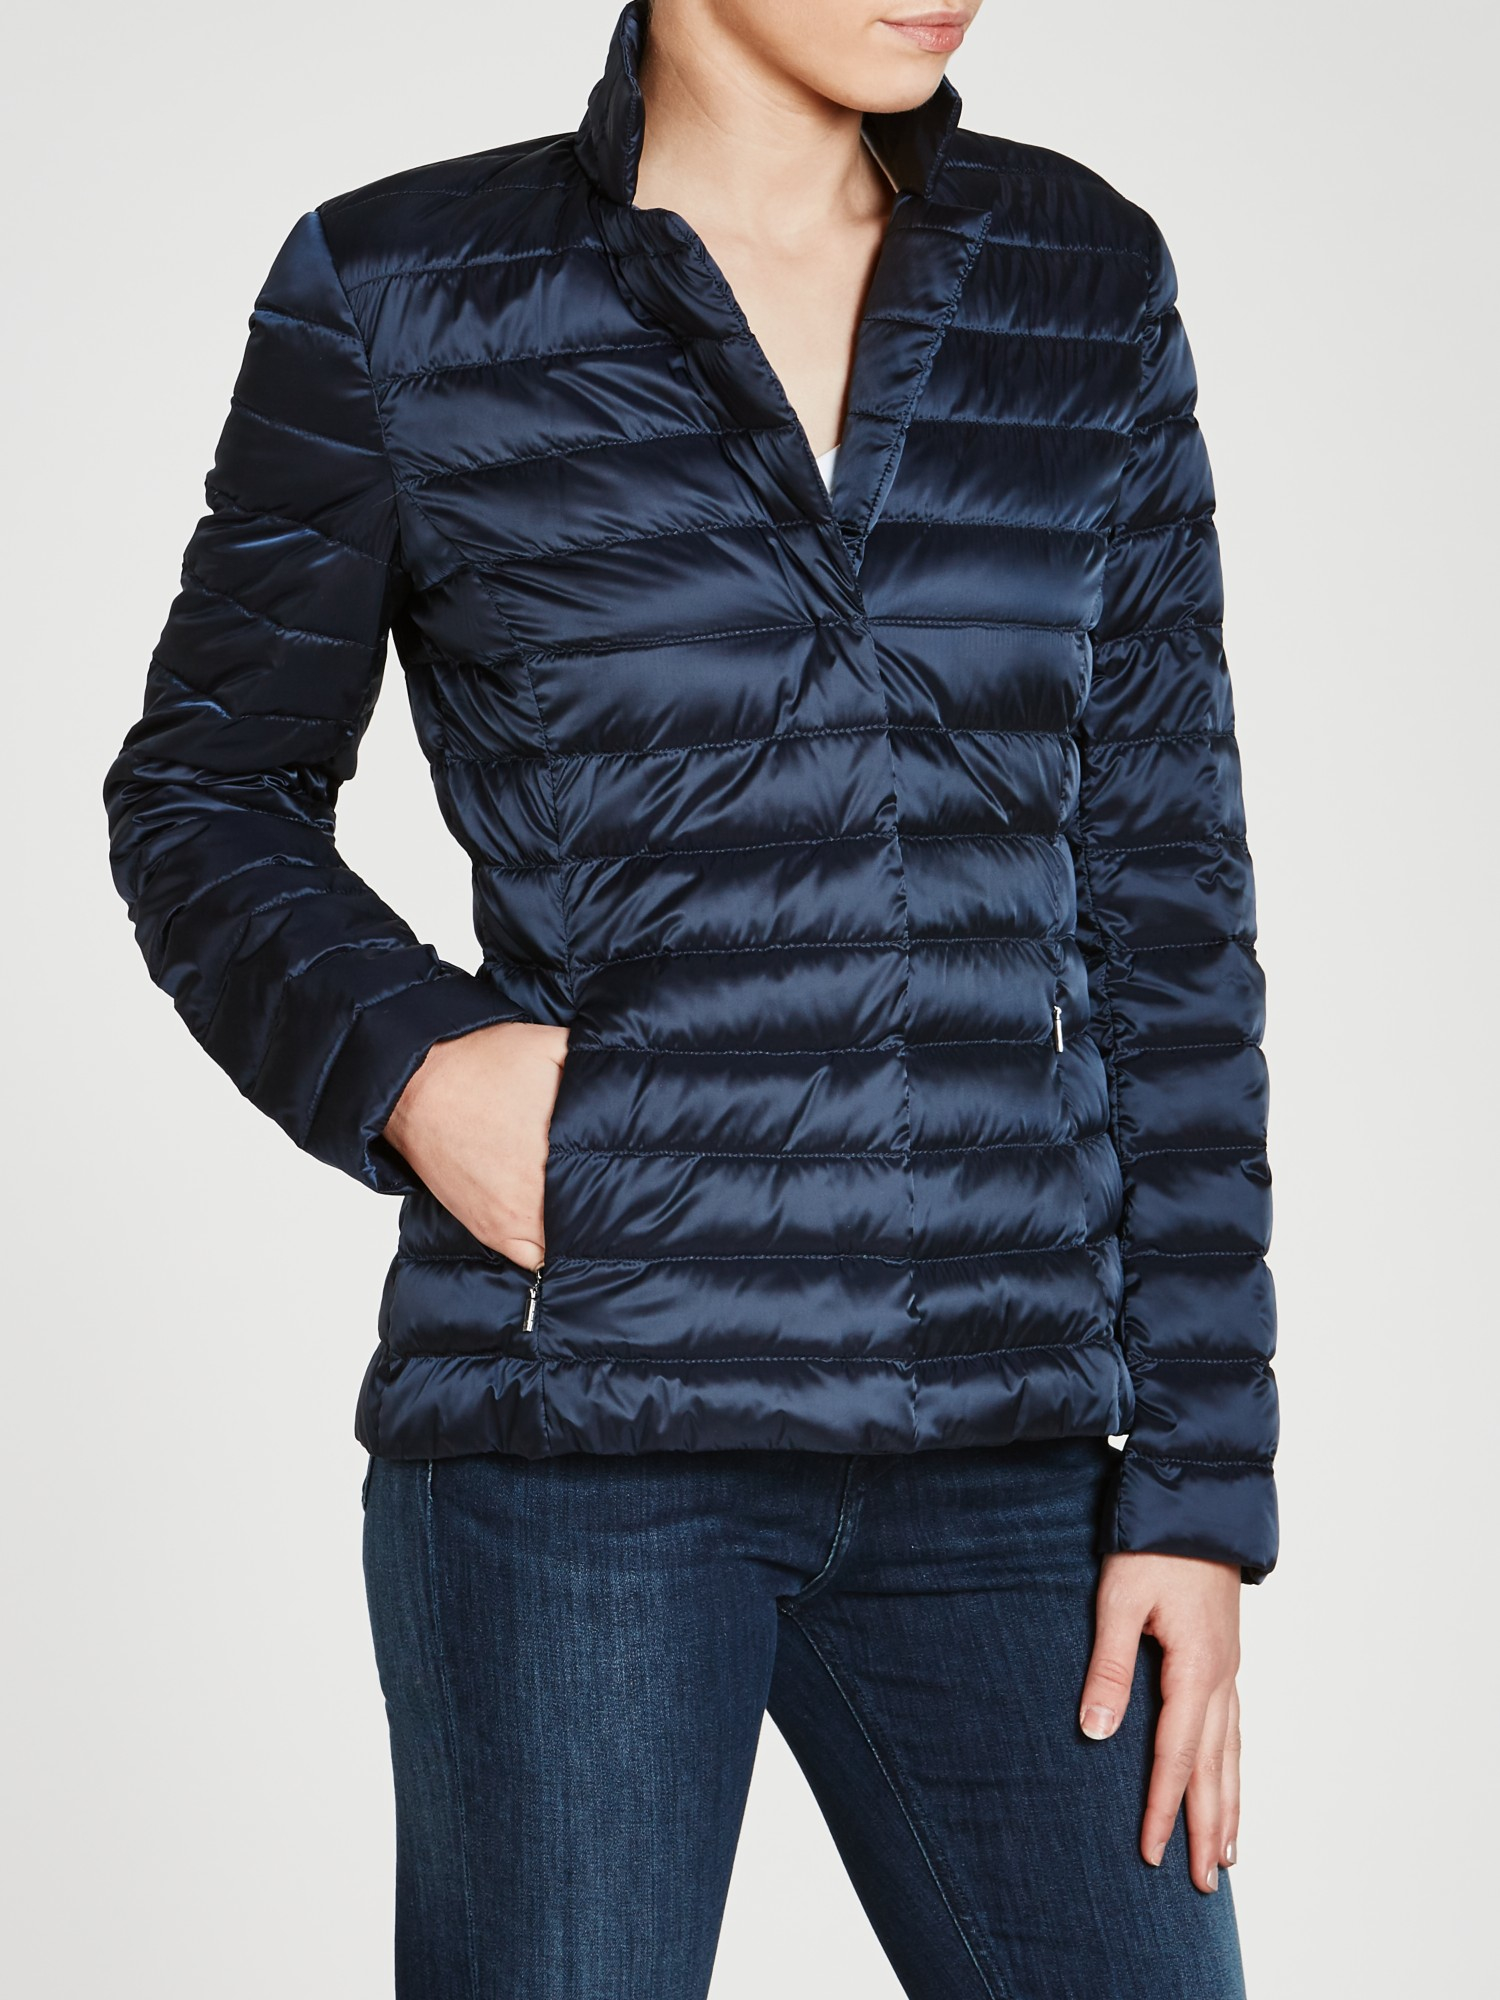 Lyst - Weekend by maxmara Chiara Quilted Jacket in Blue : max mara quilted jacket - Adamdwight.com